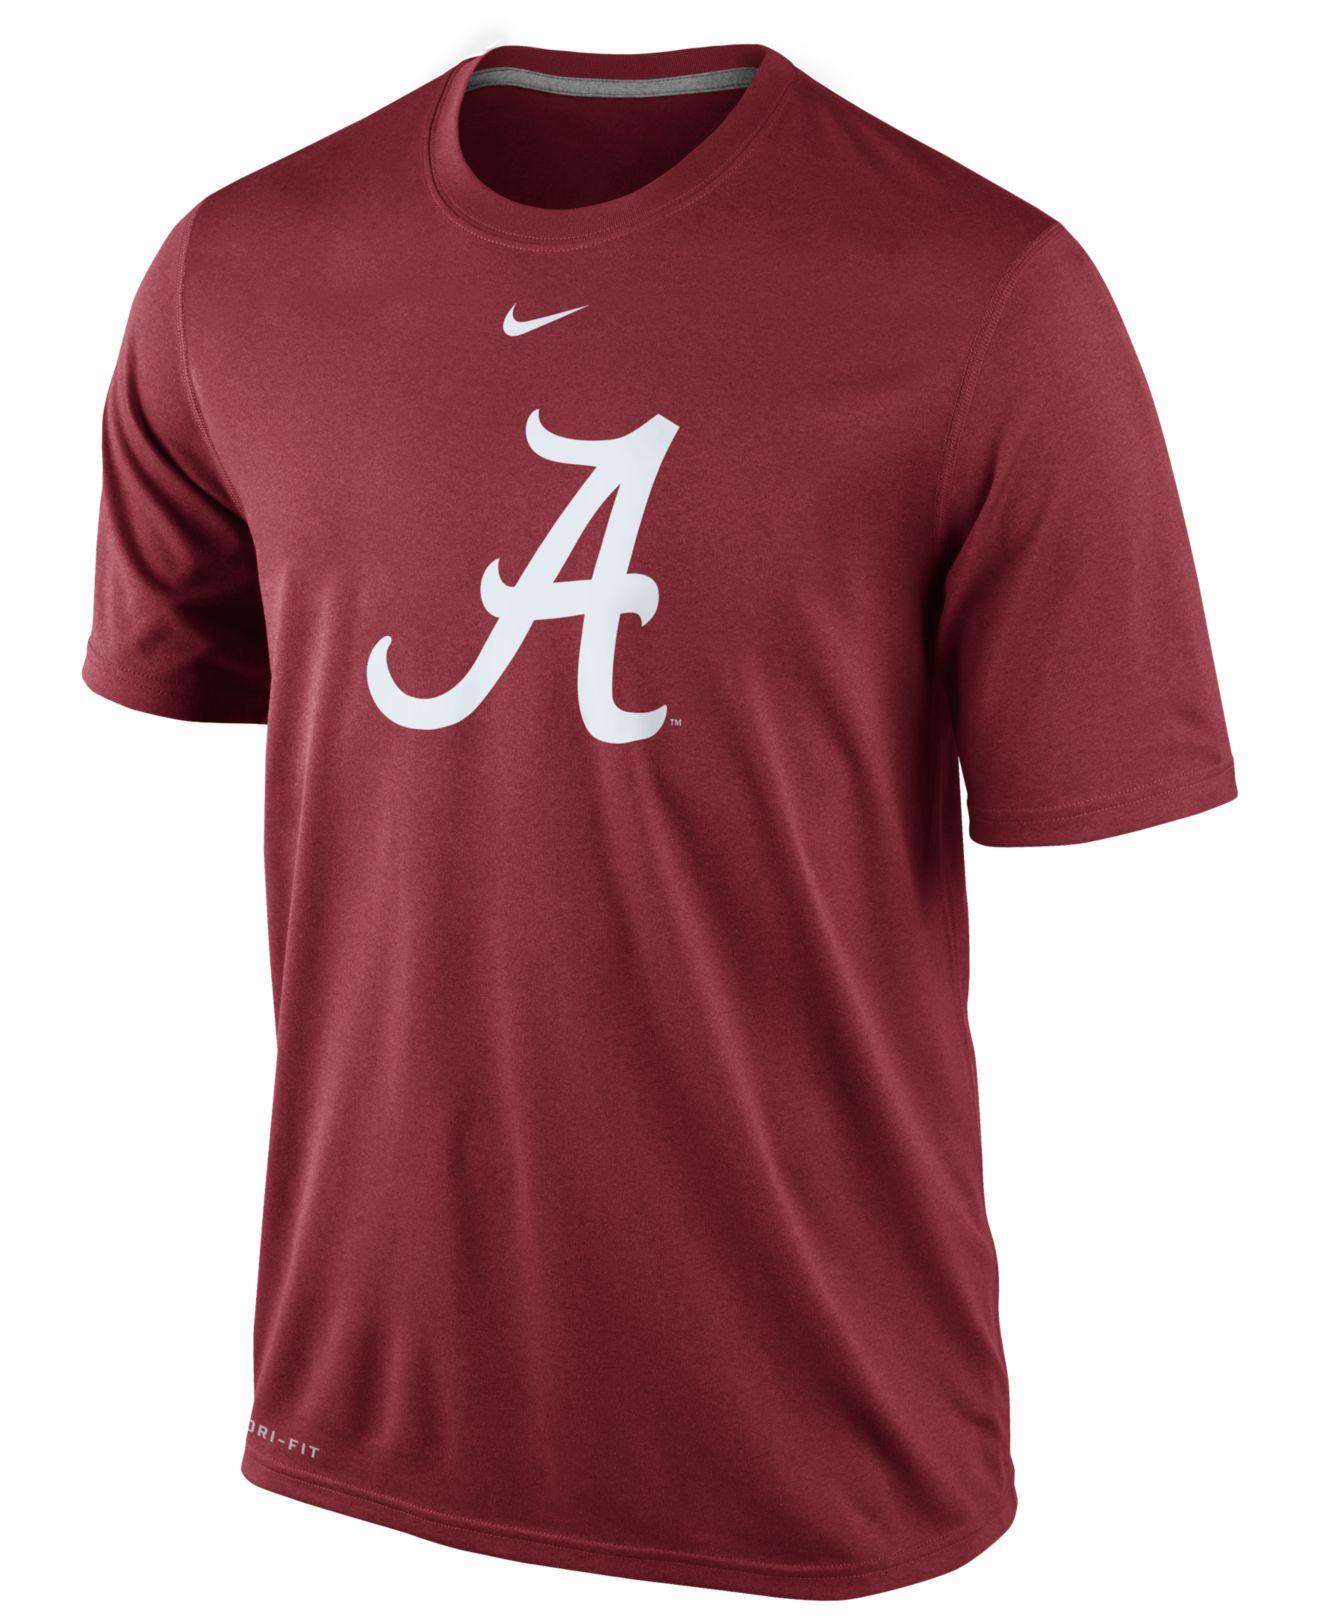 Nike men 39 s alabama crimson tide dri fit logo legend t for Alabama crimson tide tee shirts